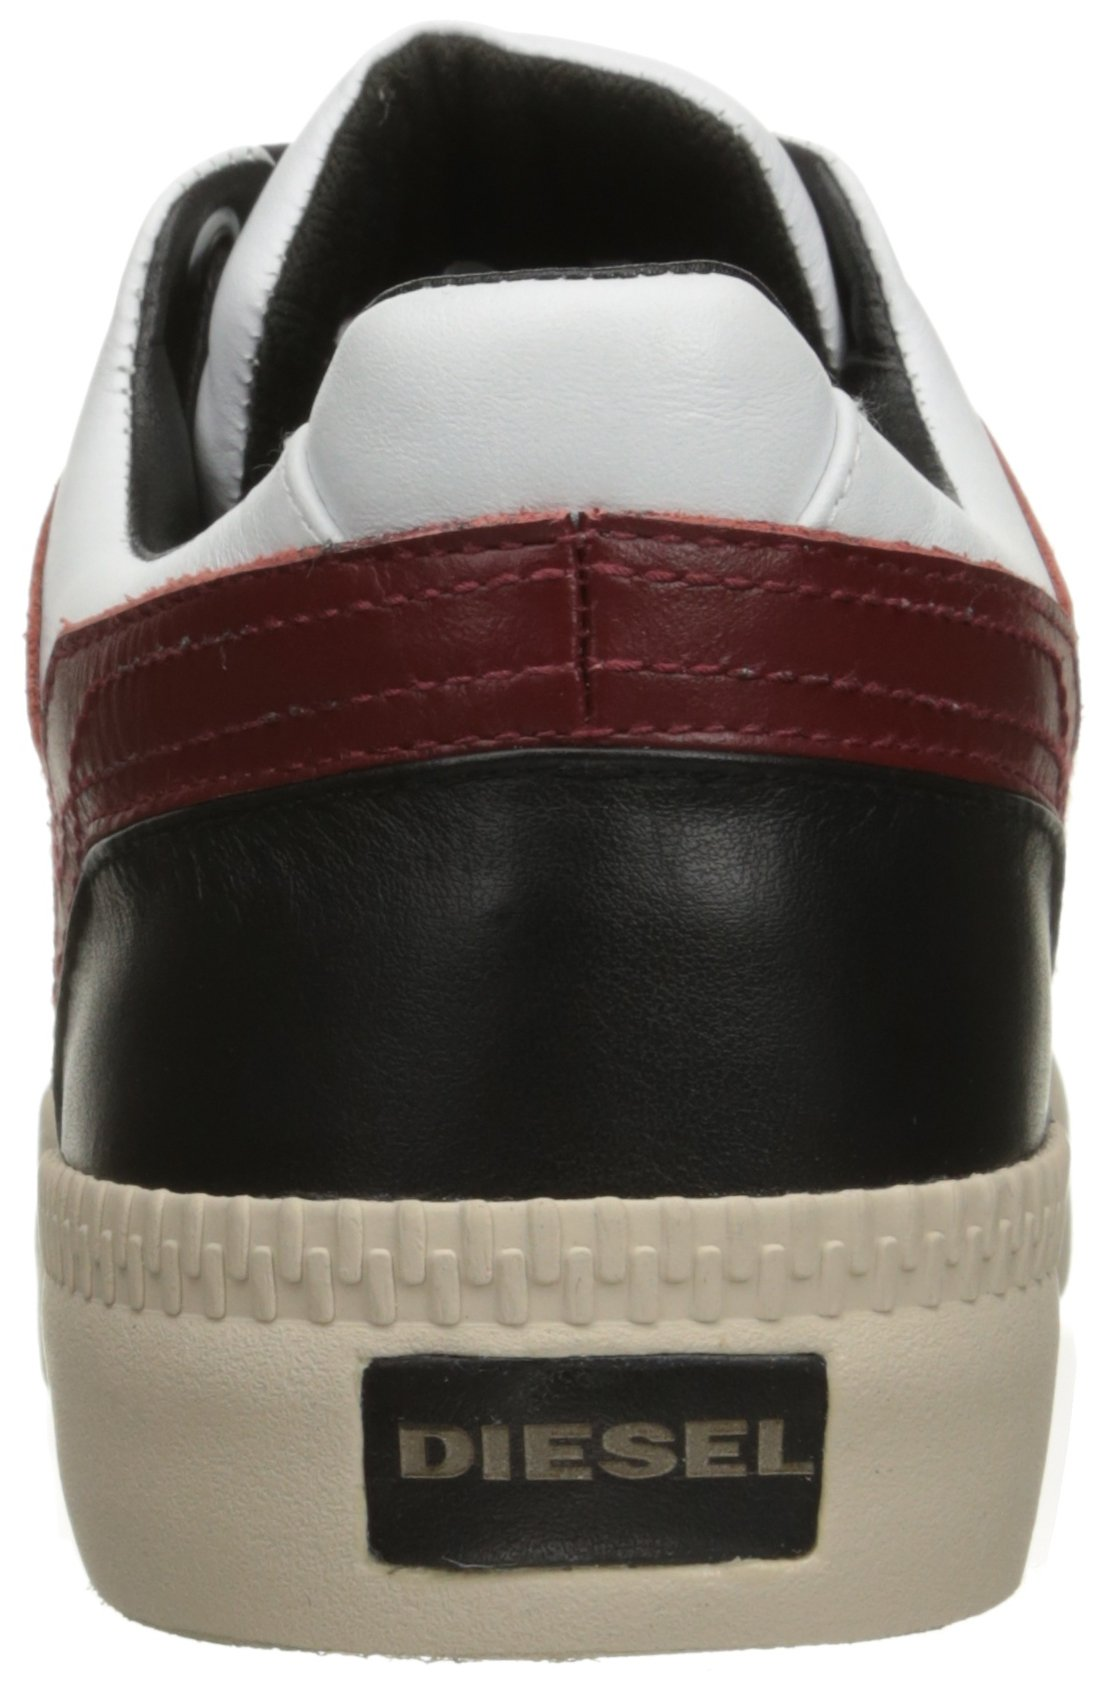 Diesel Men's V S-Spaark Low Fashion Sneaker, Black/White/Biking Red, 10.5 M US by Diesel (Image #2)